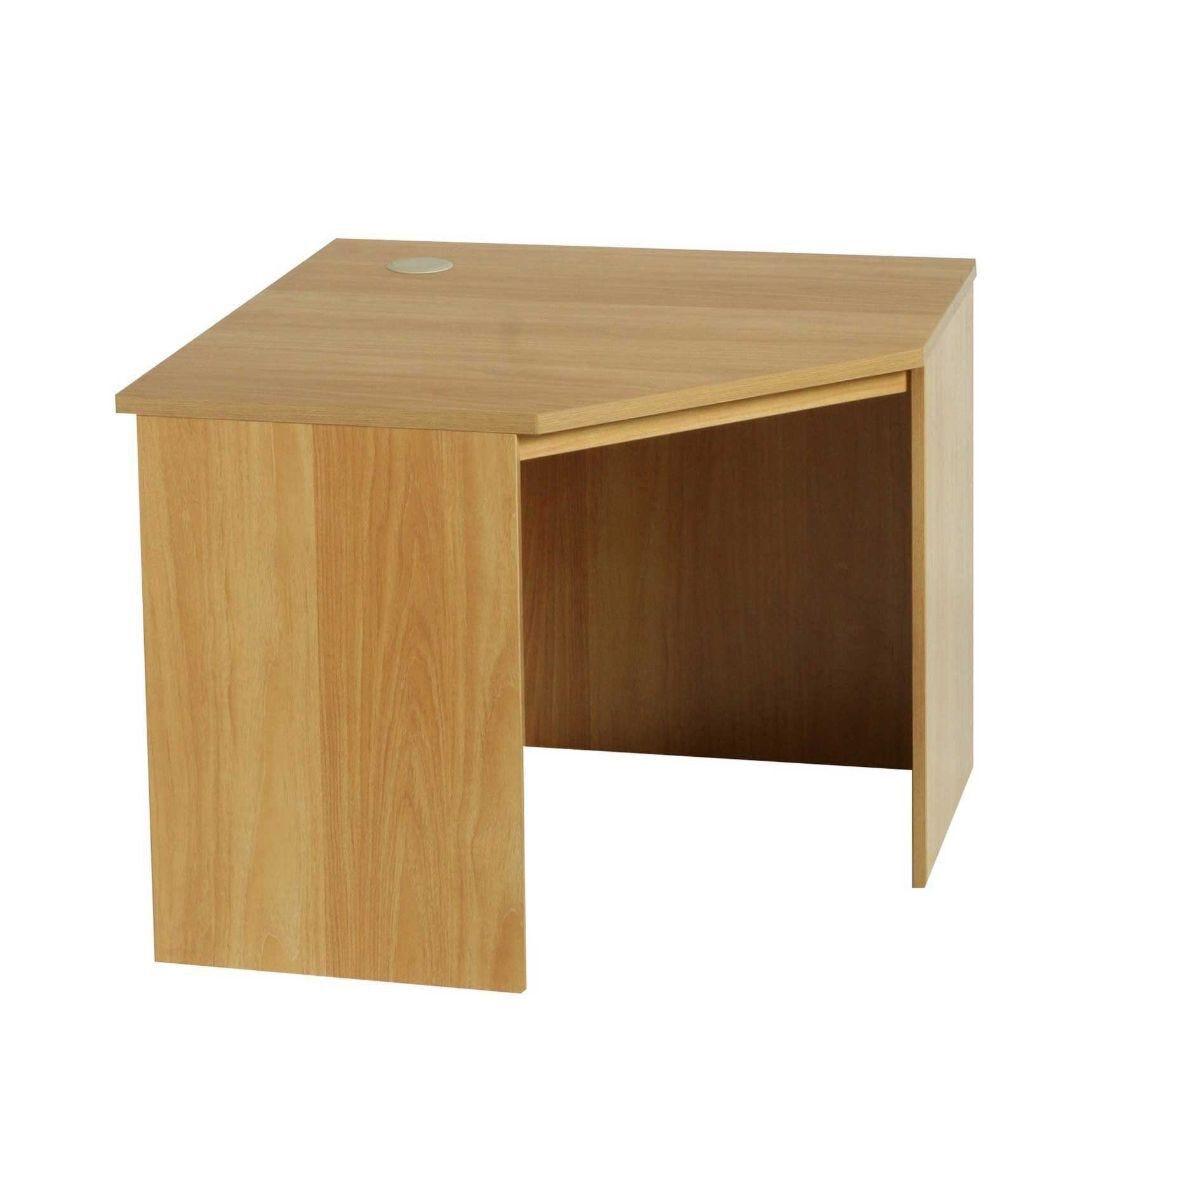 R White Corner Desk B-CDK H728xW940xD540mm English Oak